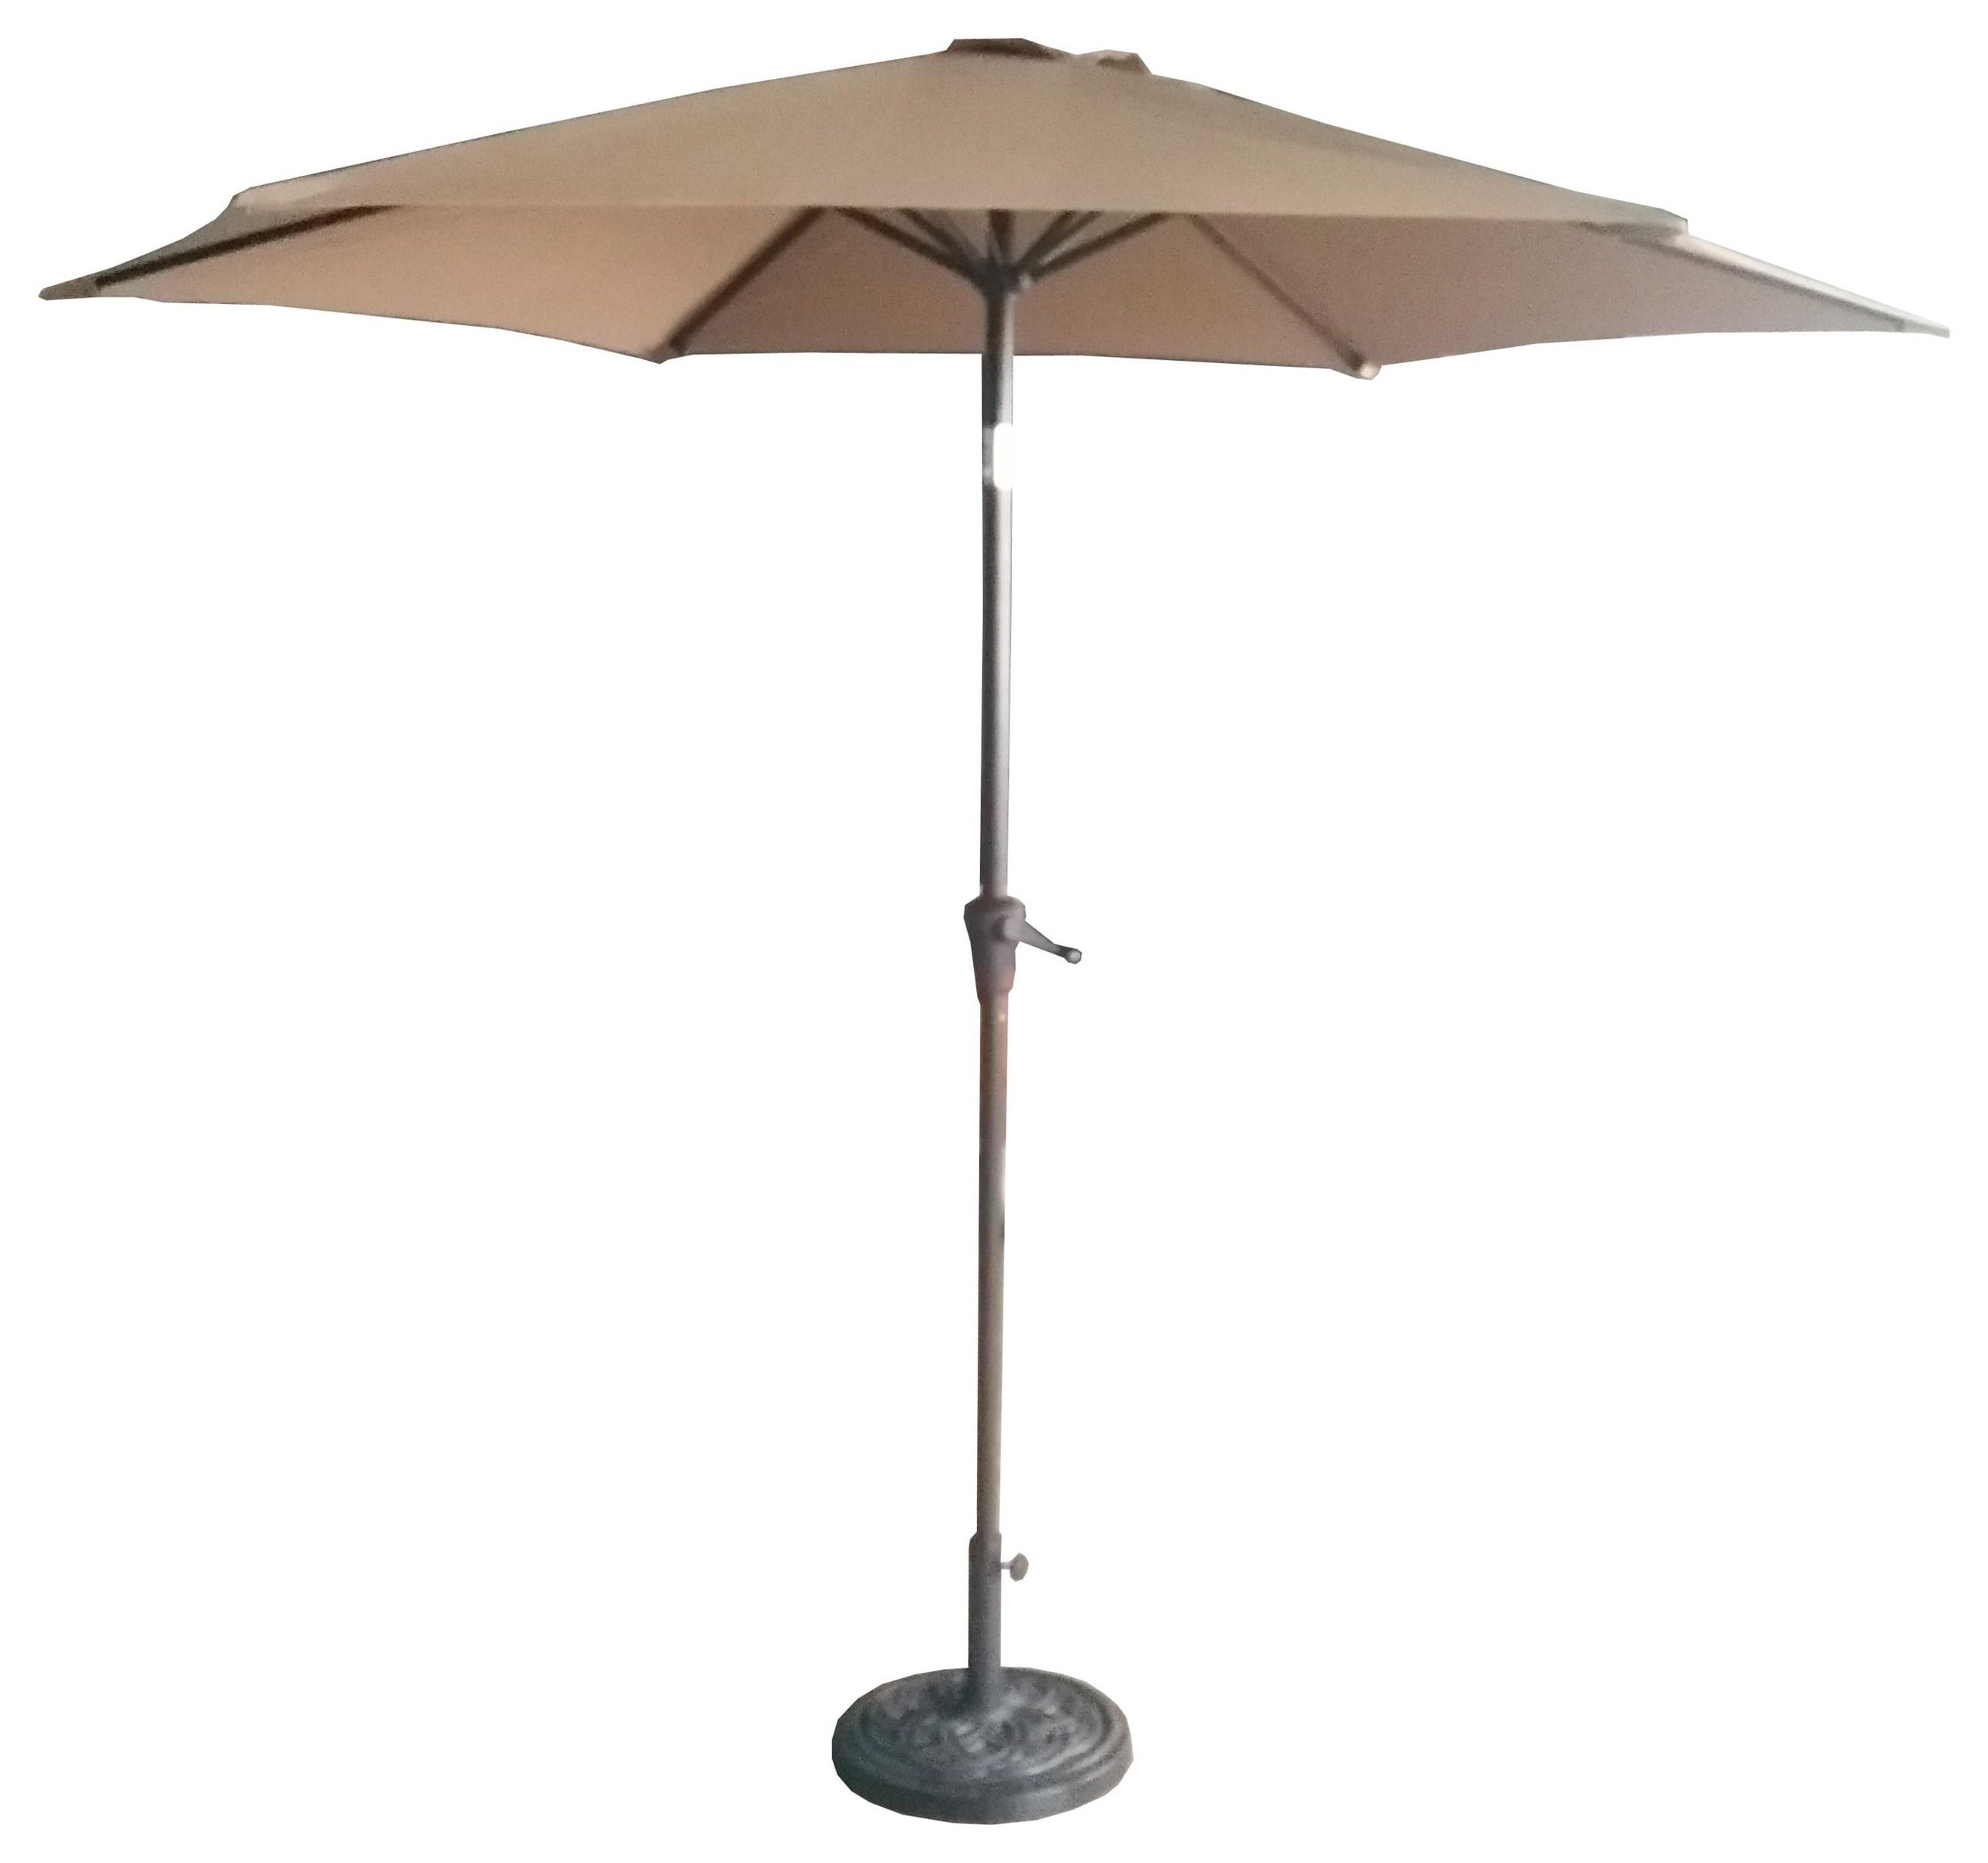 UMBRELLA 9' Tan Umbrella by GatherCraft at Darvin Furniture